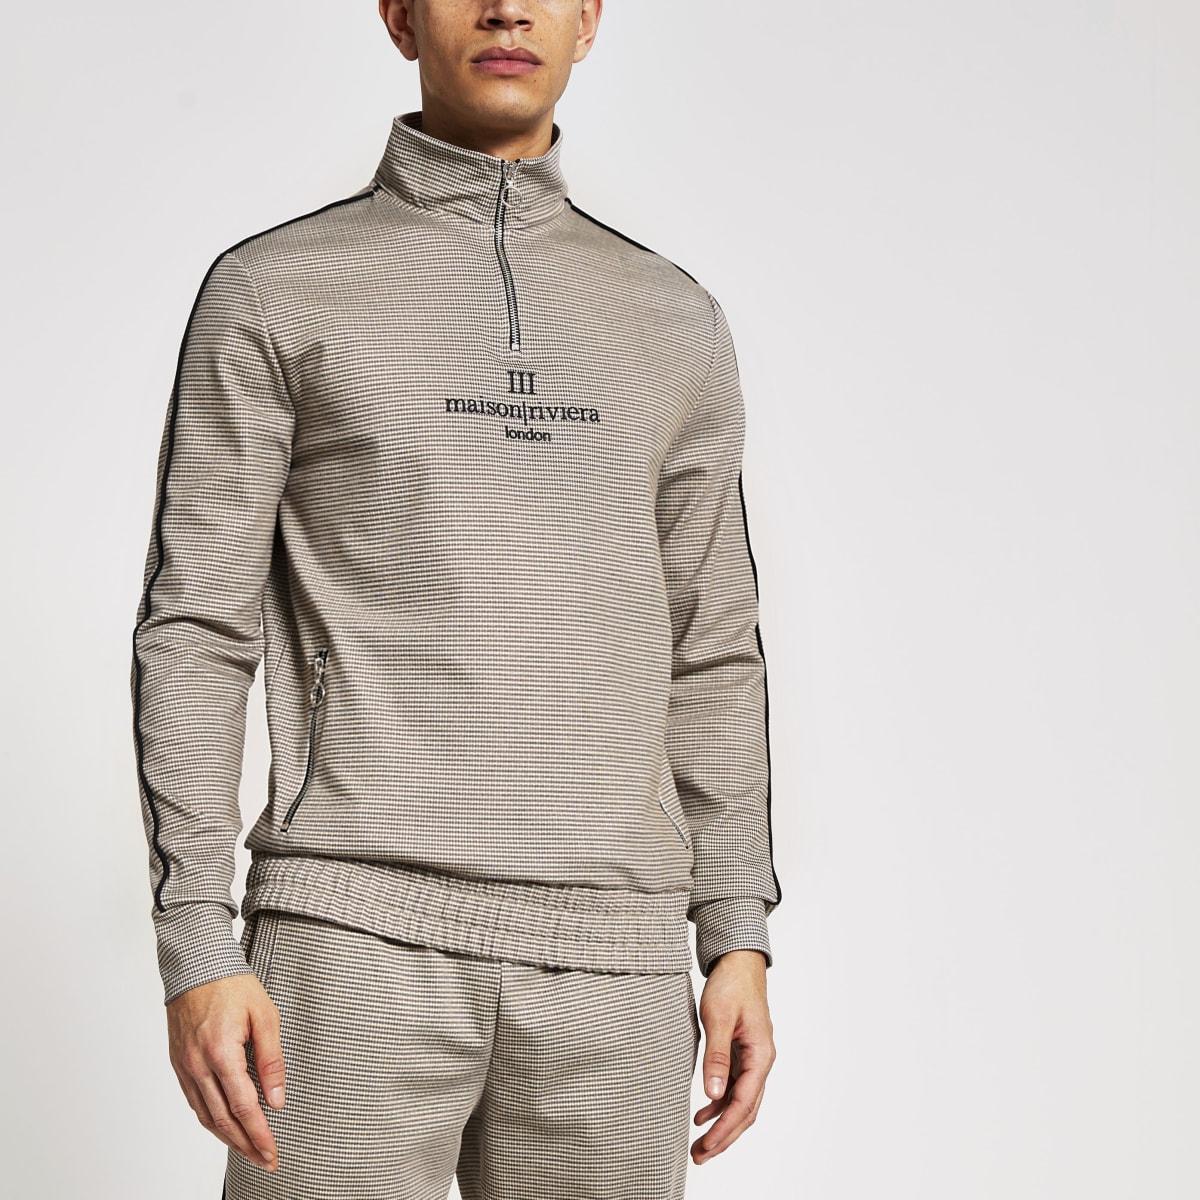 Maison Riviera brown check zip sweatshirt